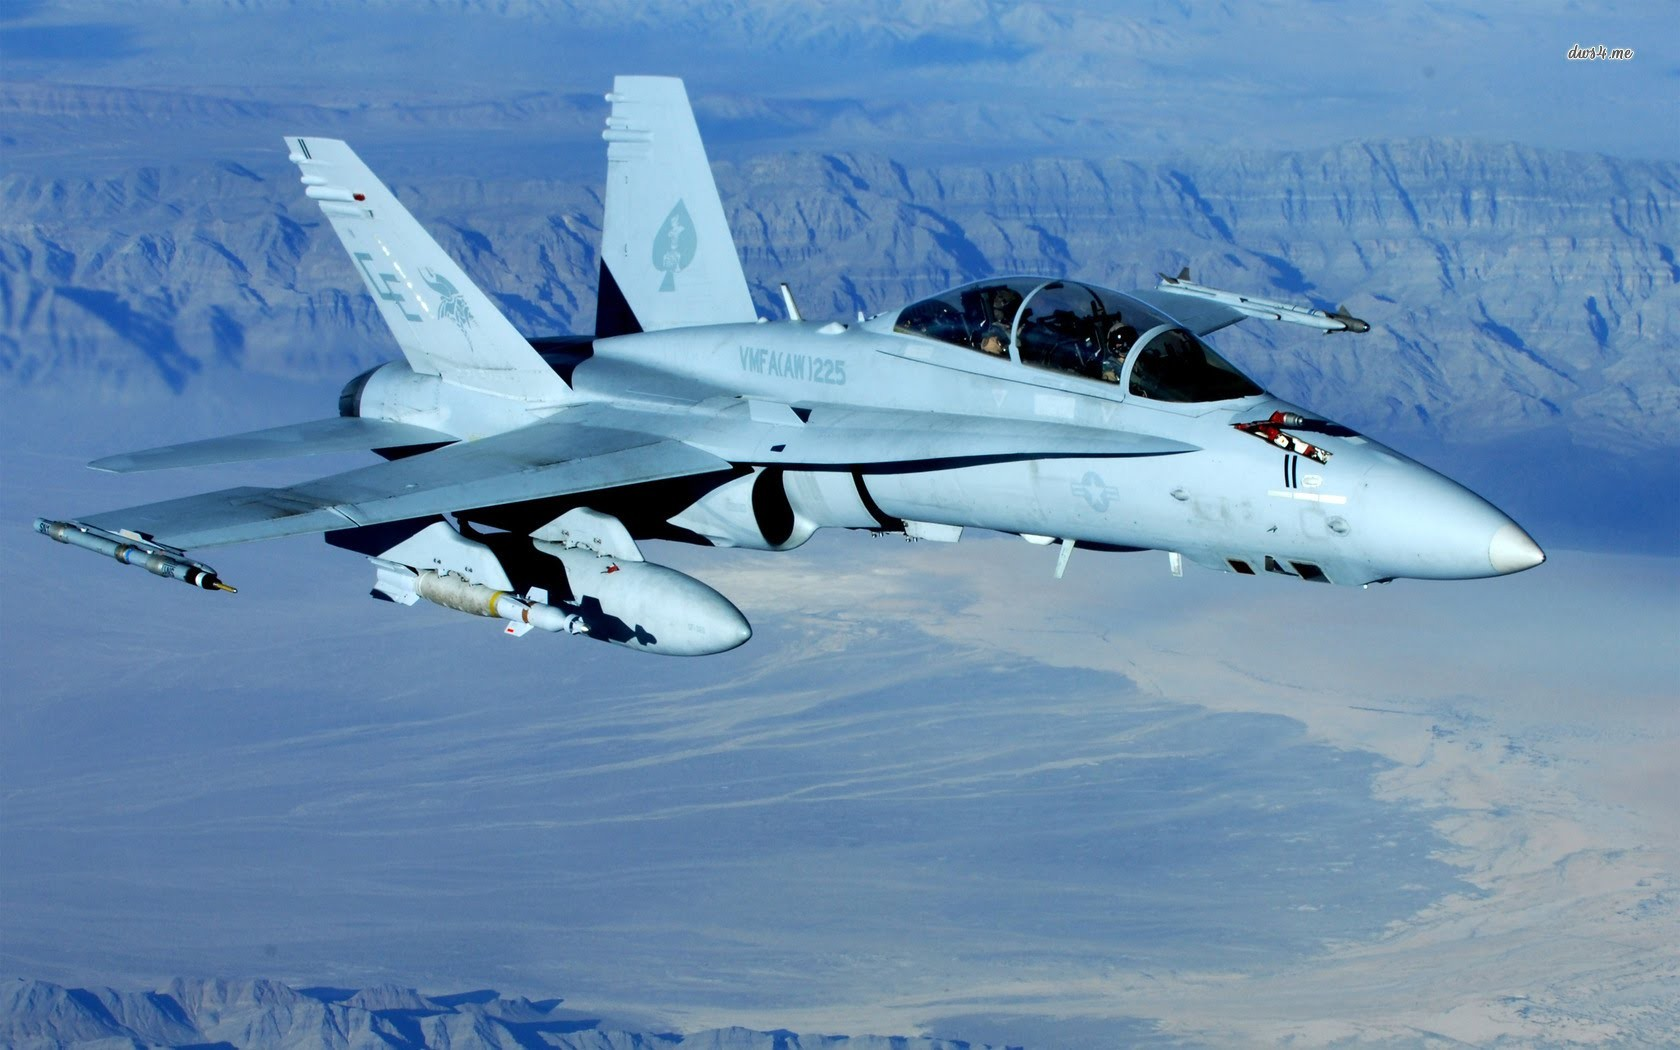 ВВС США появились взоне воздушной операции ВКС РФ вСирии